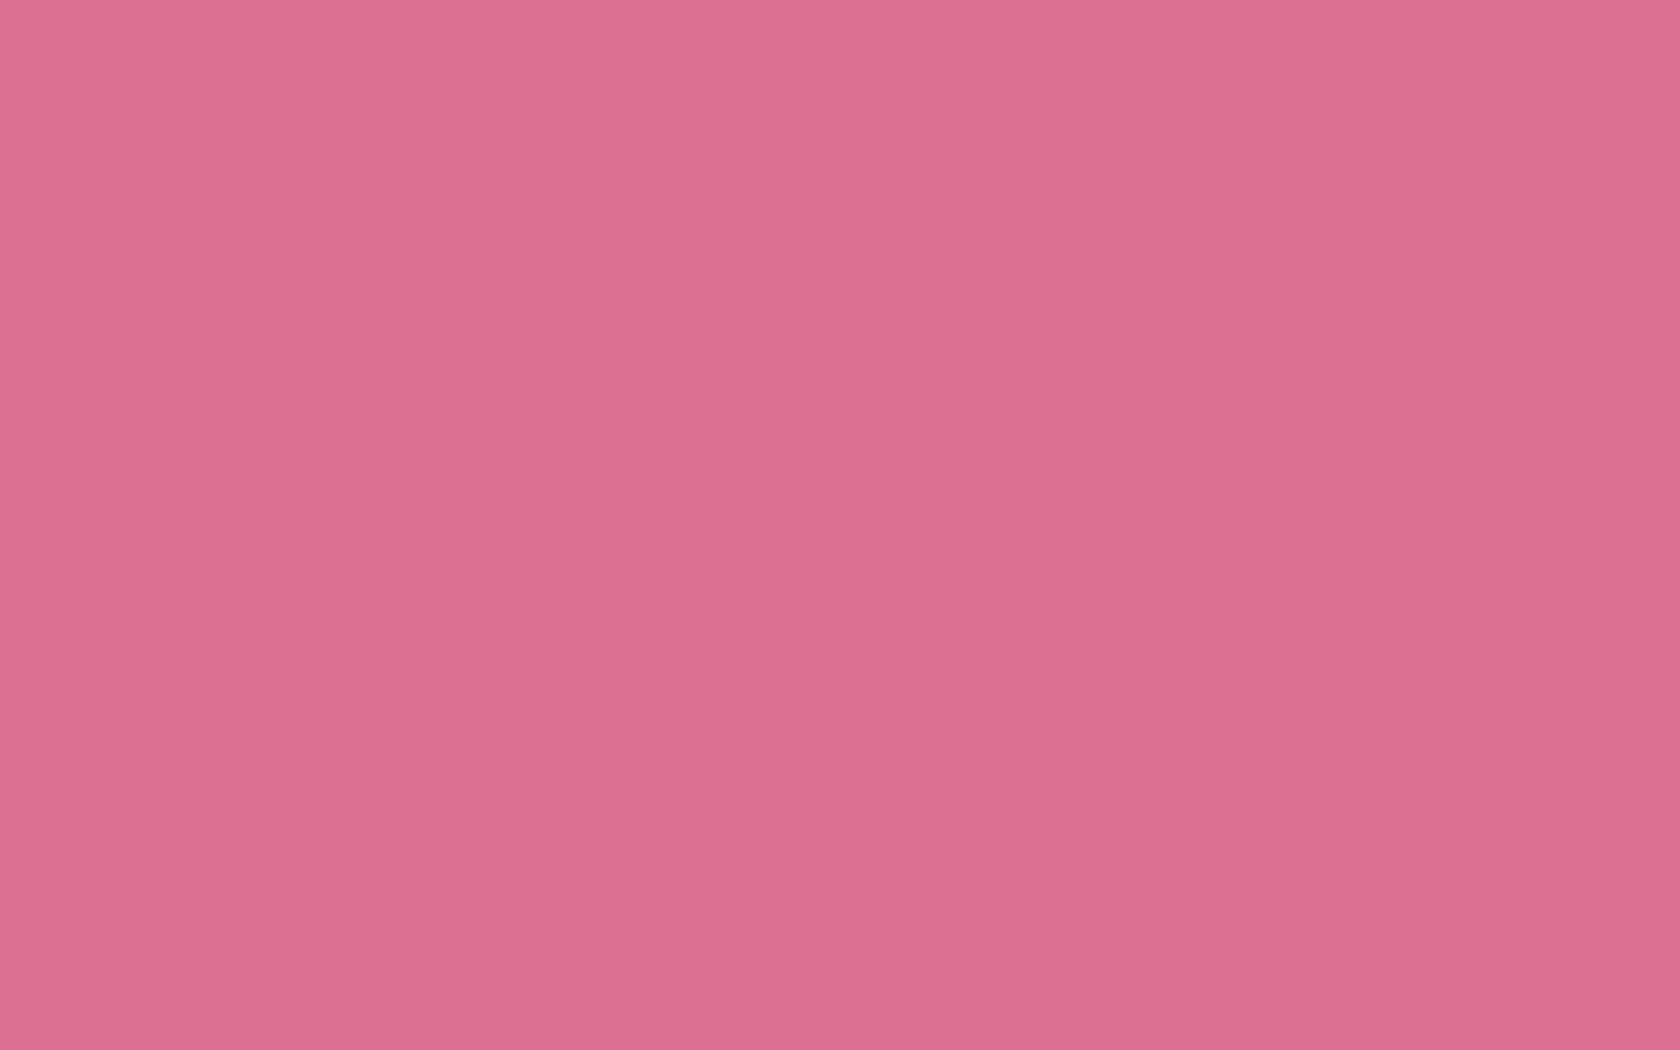 1680x1050 Pale Violet-red Solid Color Background